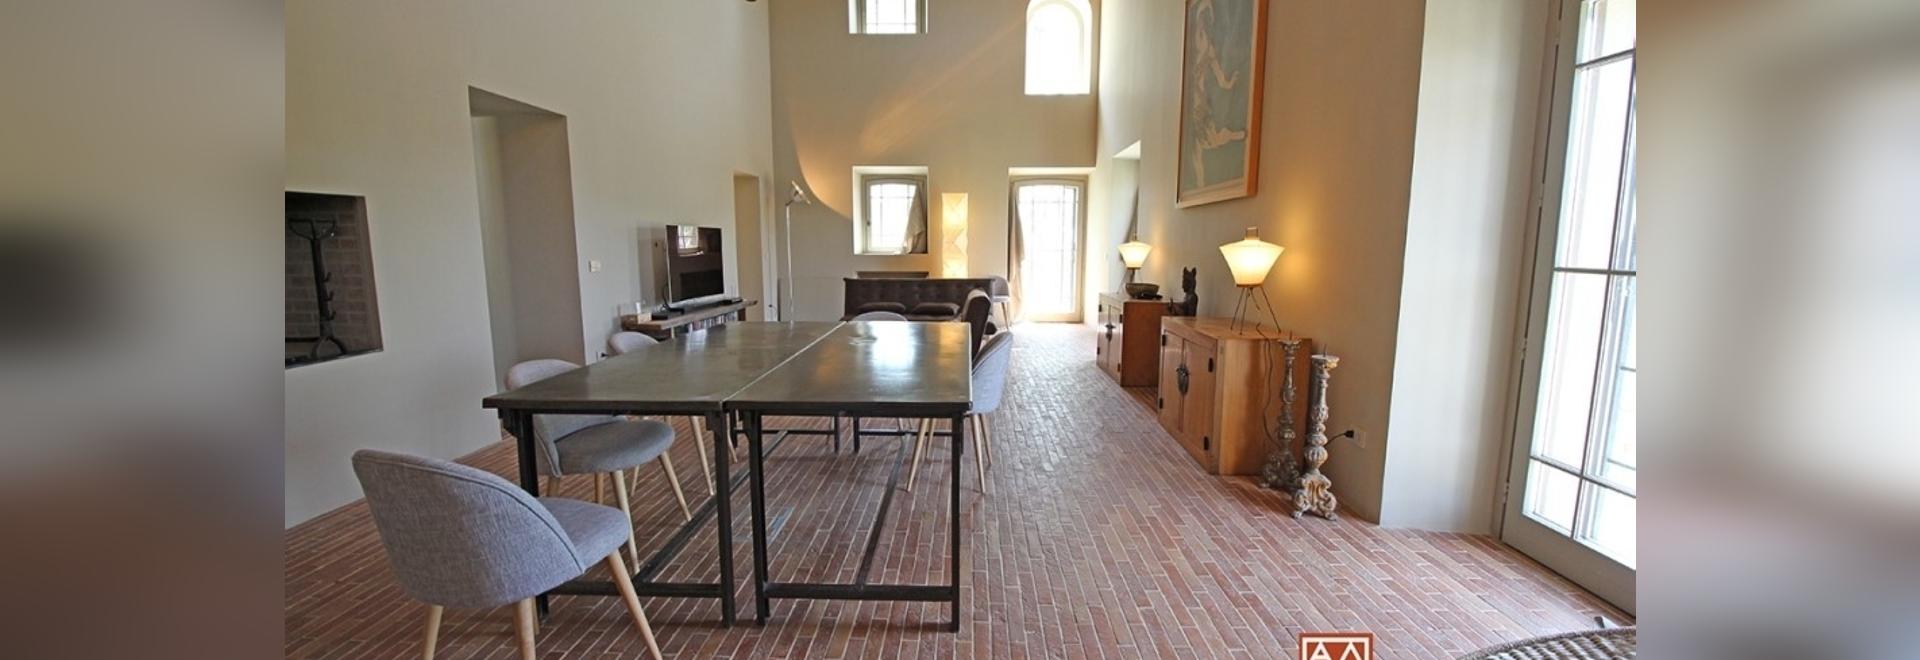 Villa on the Umbrian hills